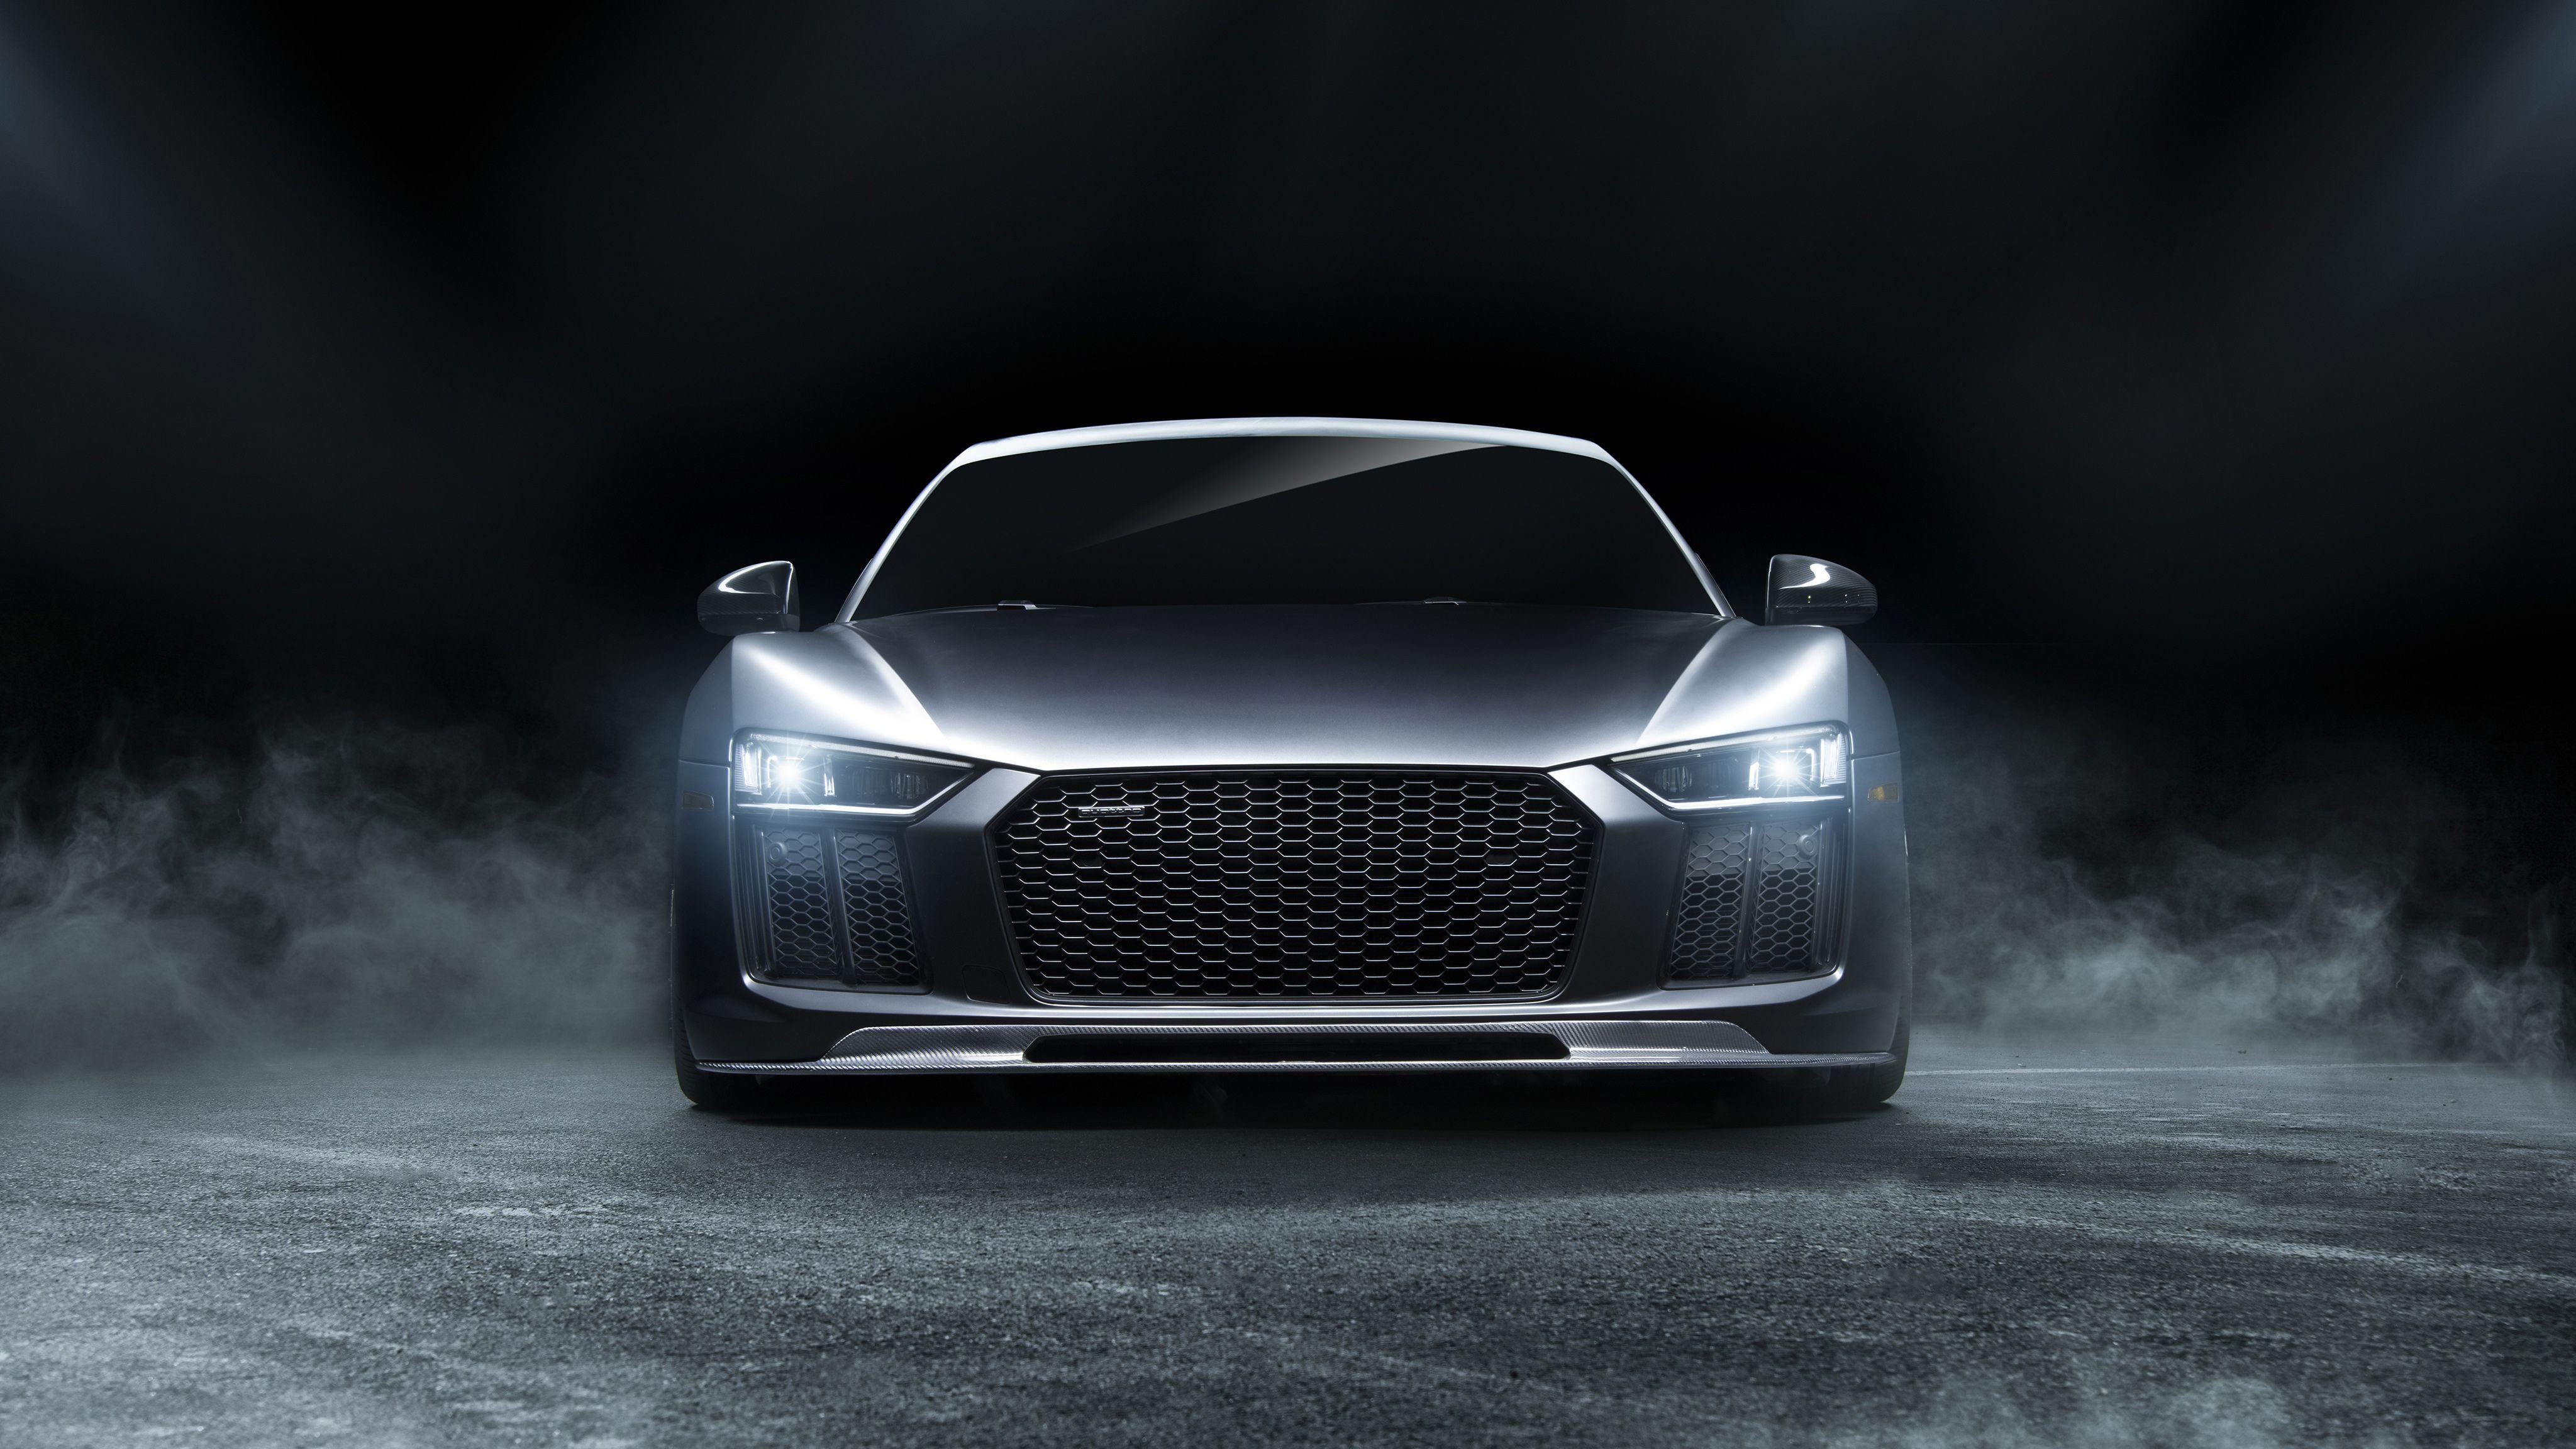 Resolution Wallpaper Supercar Quality Audi High Is Kaudi